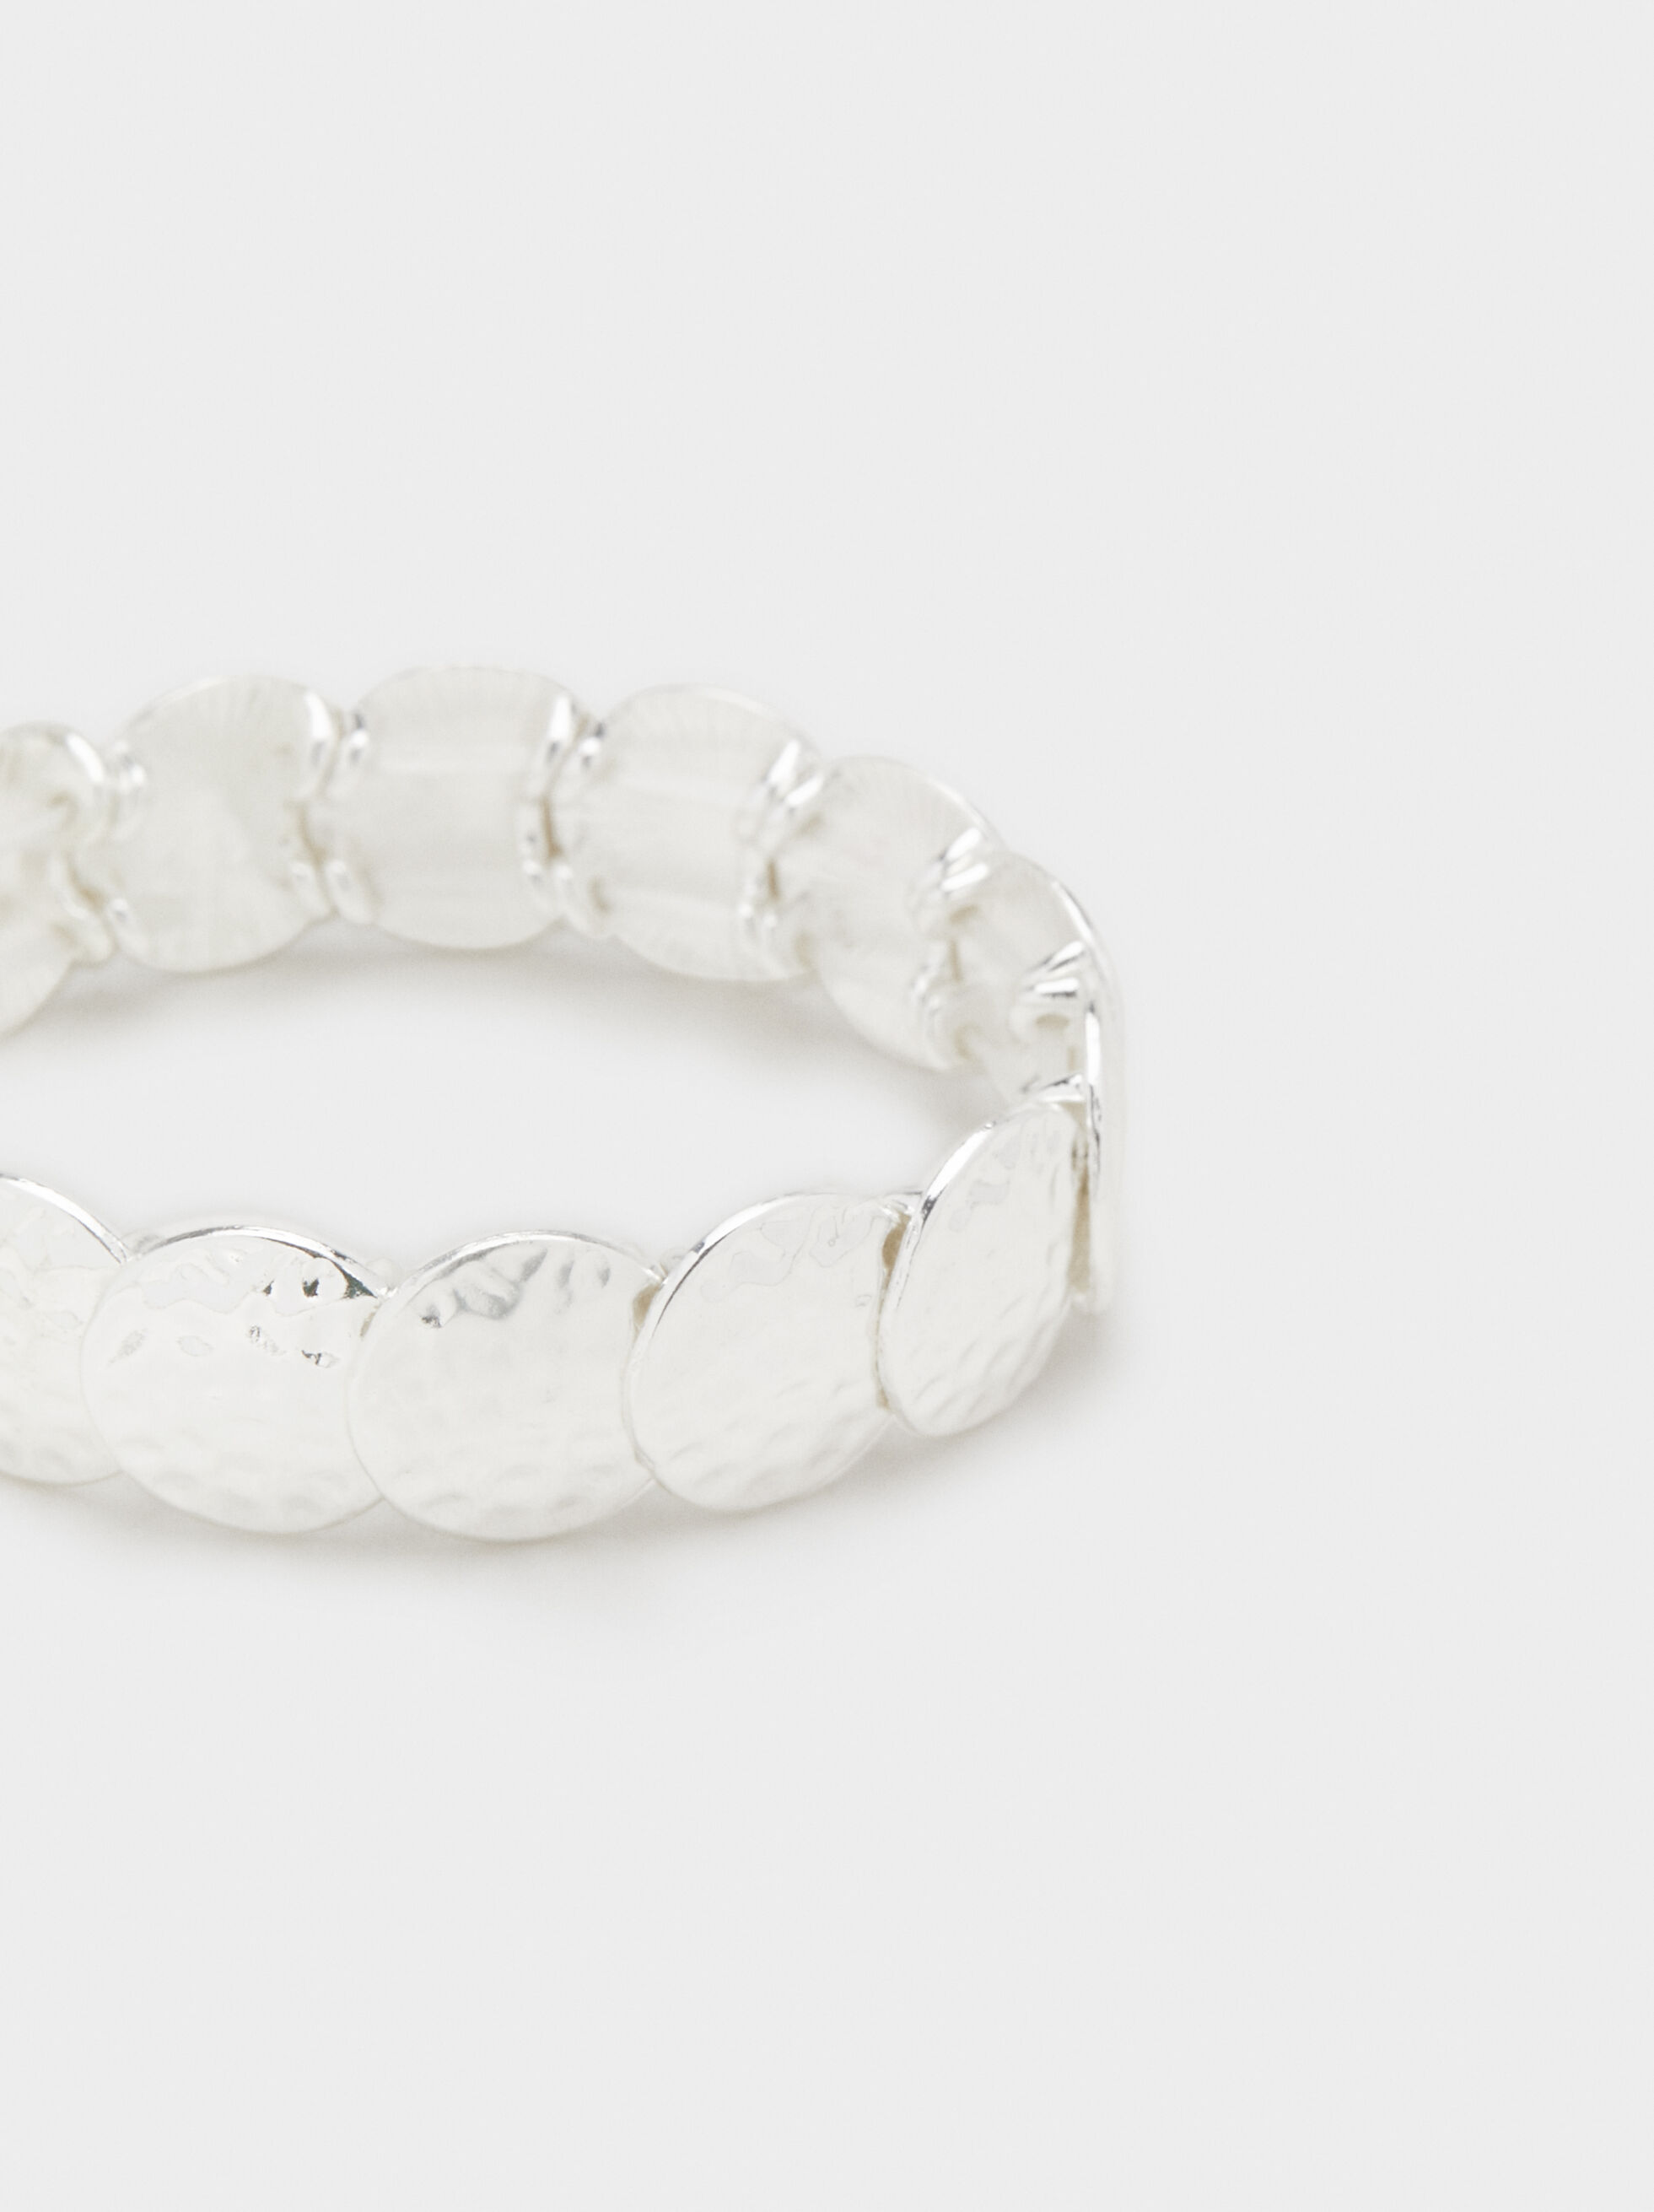 Elastic Bracelet With Circles, Silver, hi-res